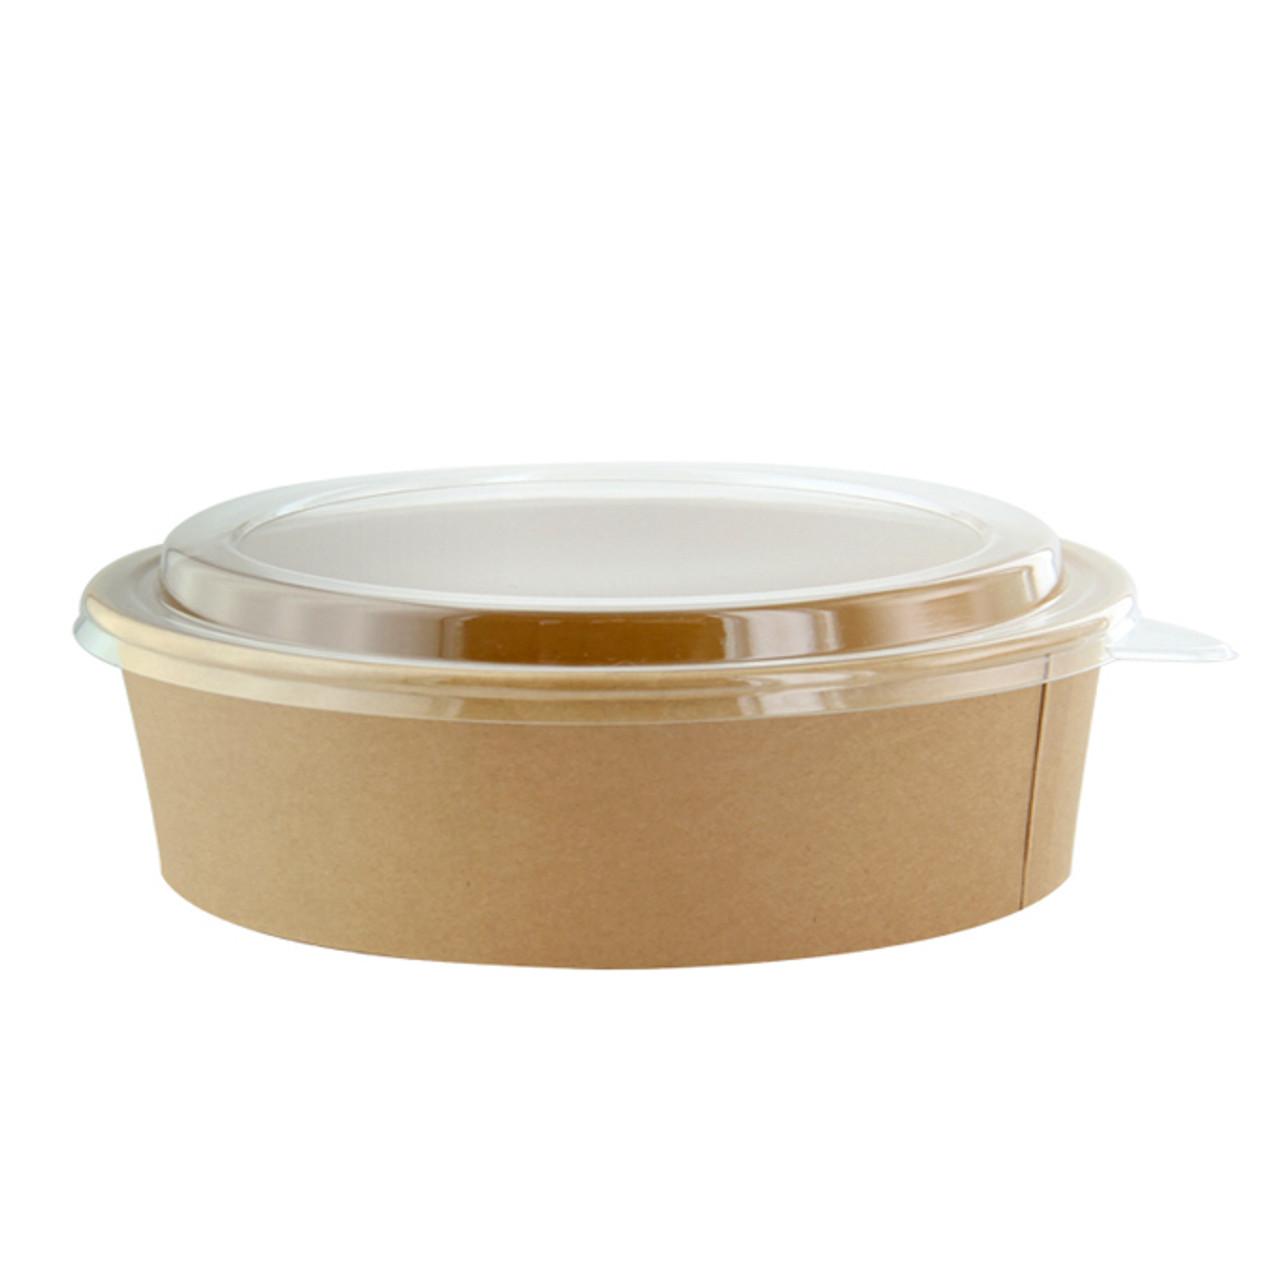 Kraft Paper Salad Bowl (without lid) - 26 oz